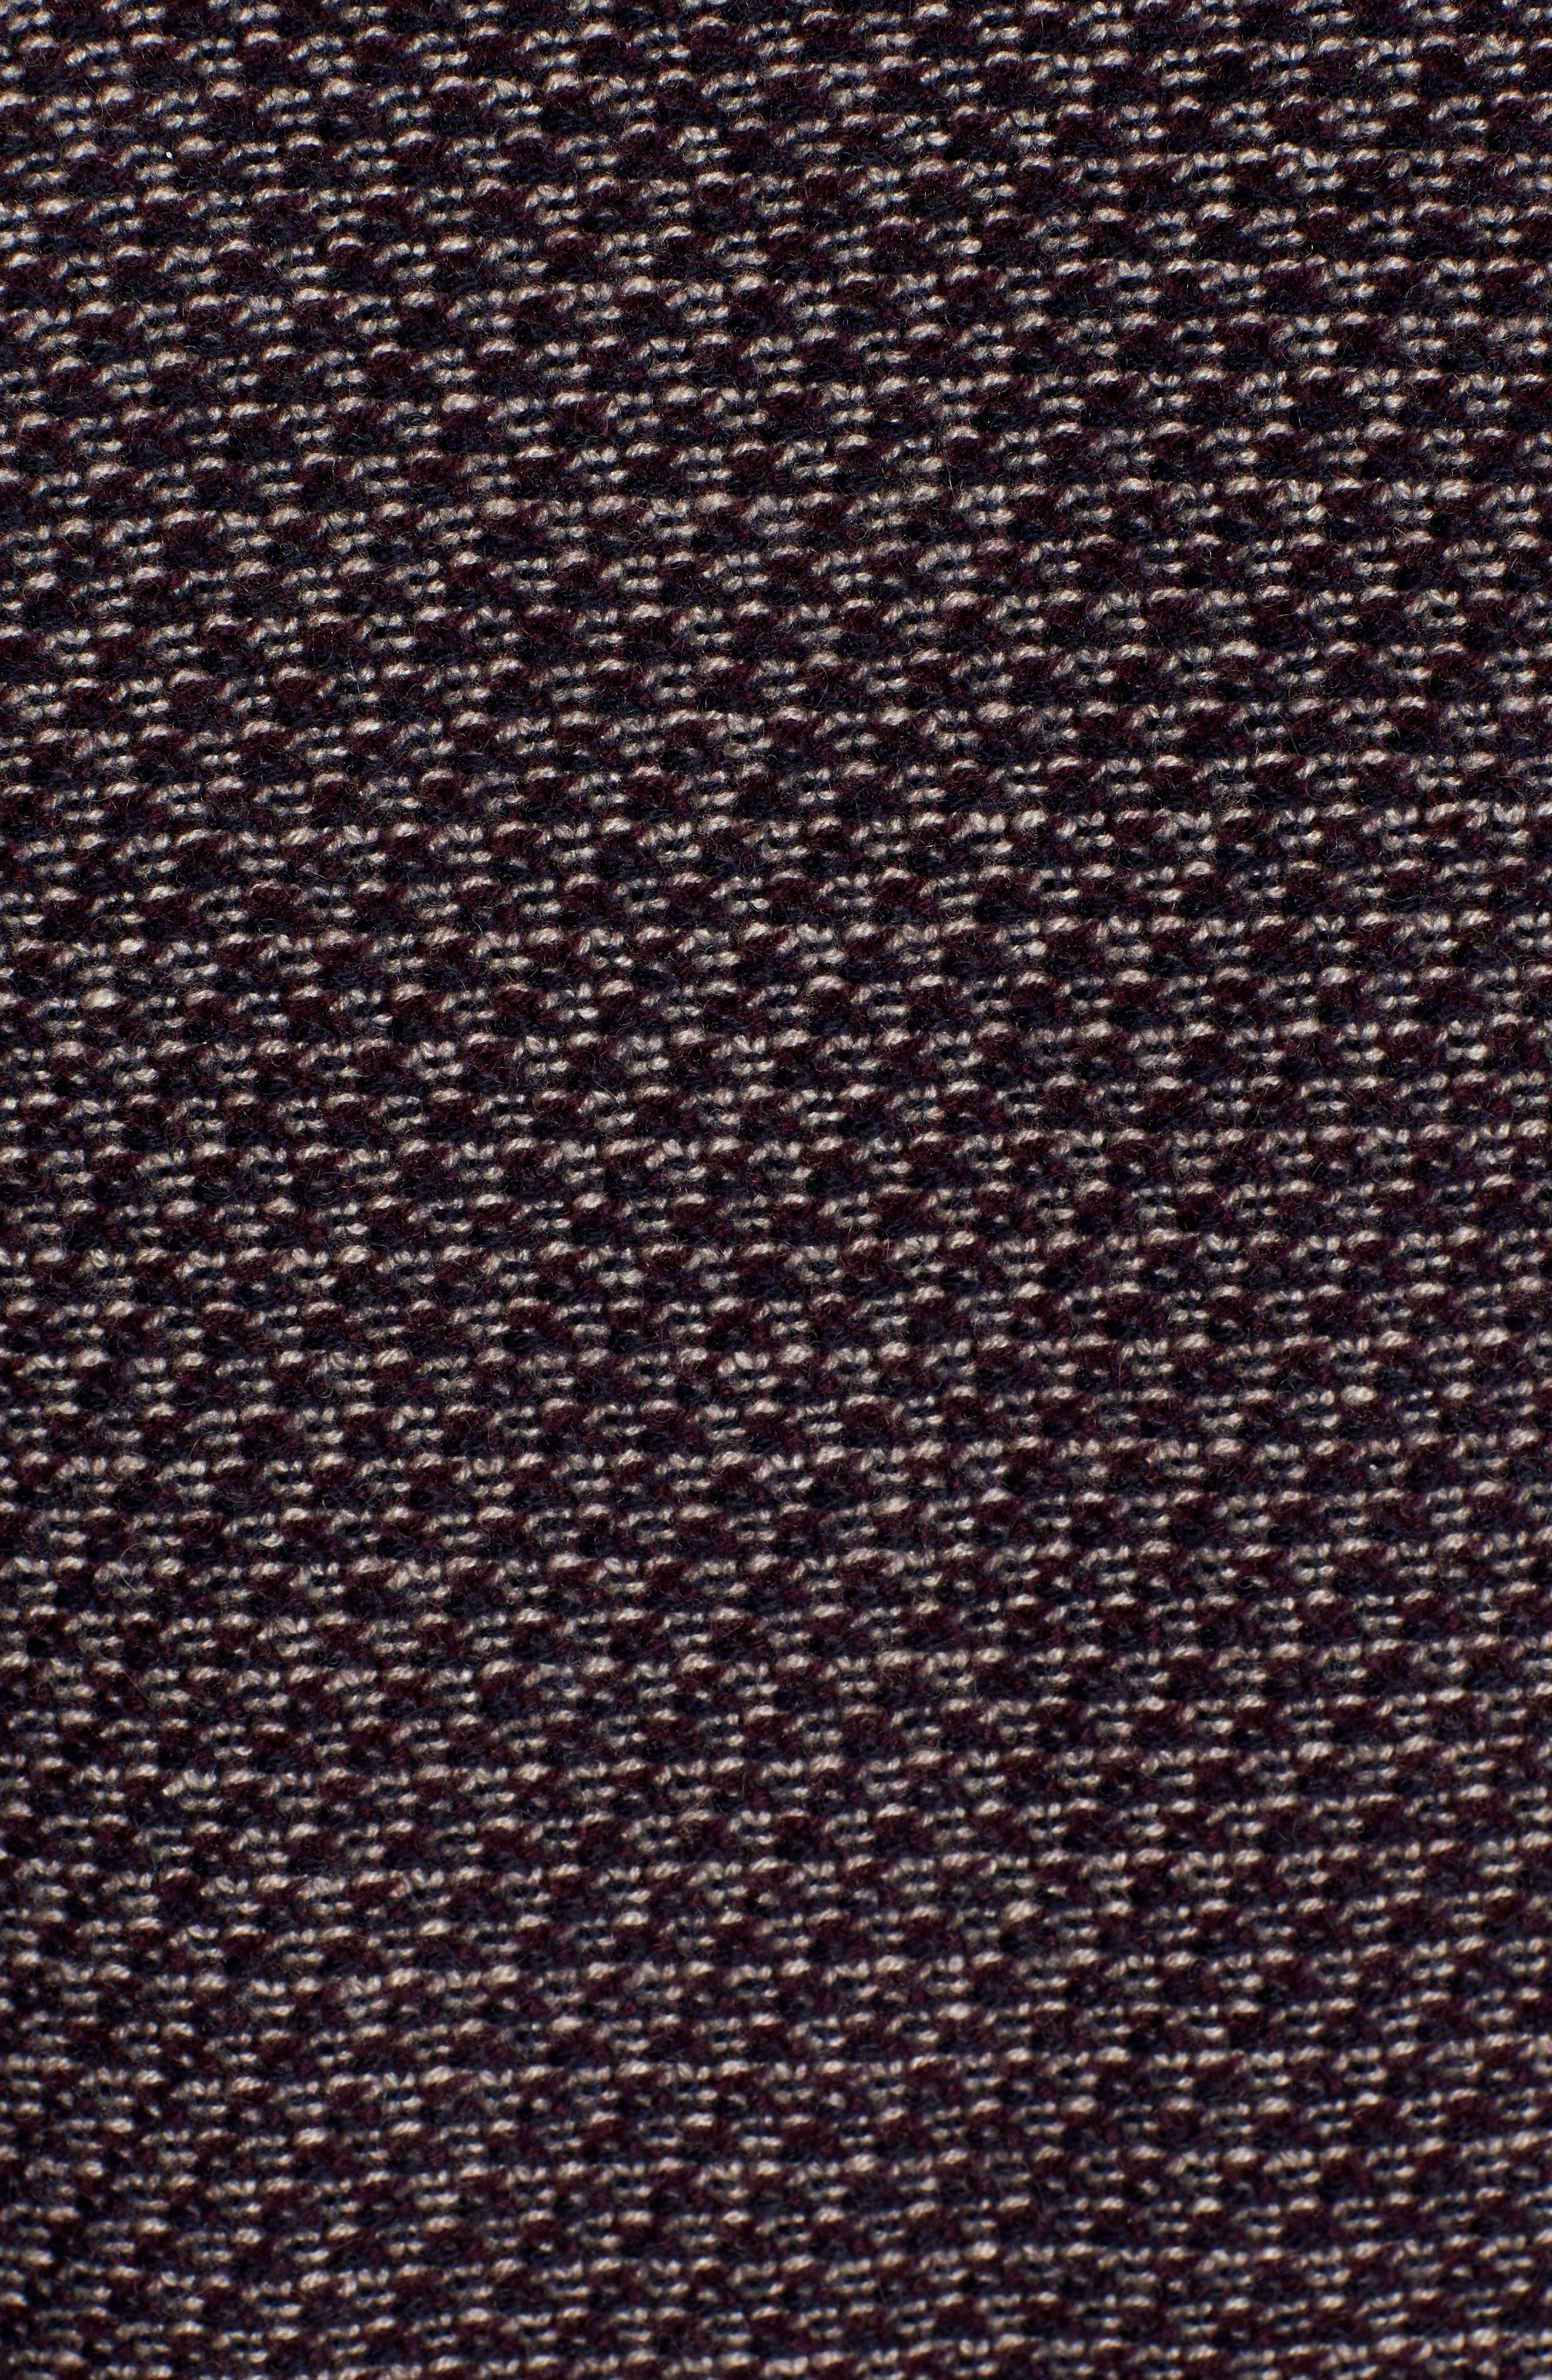 Jacquard Wool & Cashmere Sweater,                             Alternate thumbnail 5, color,                             938